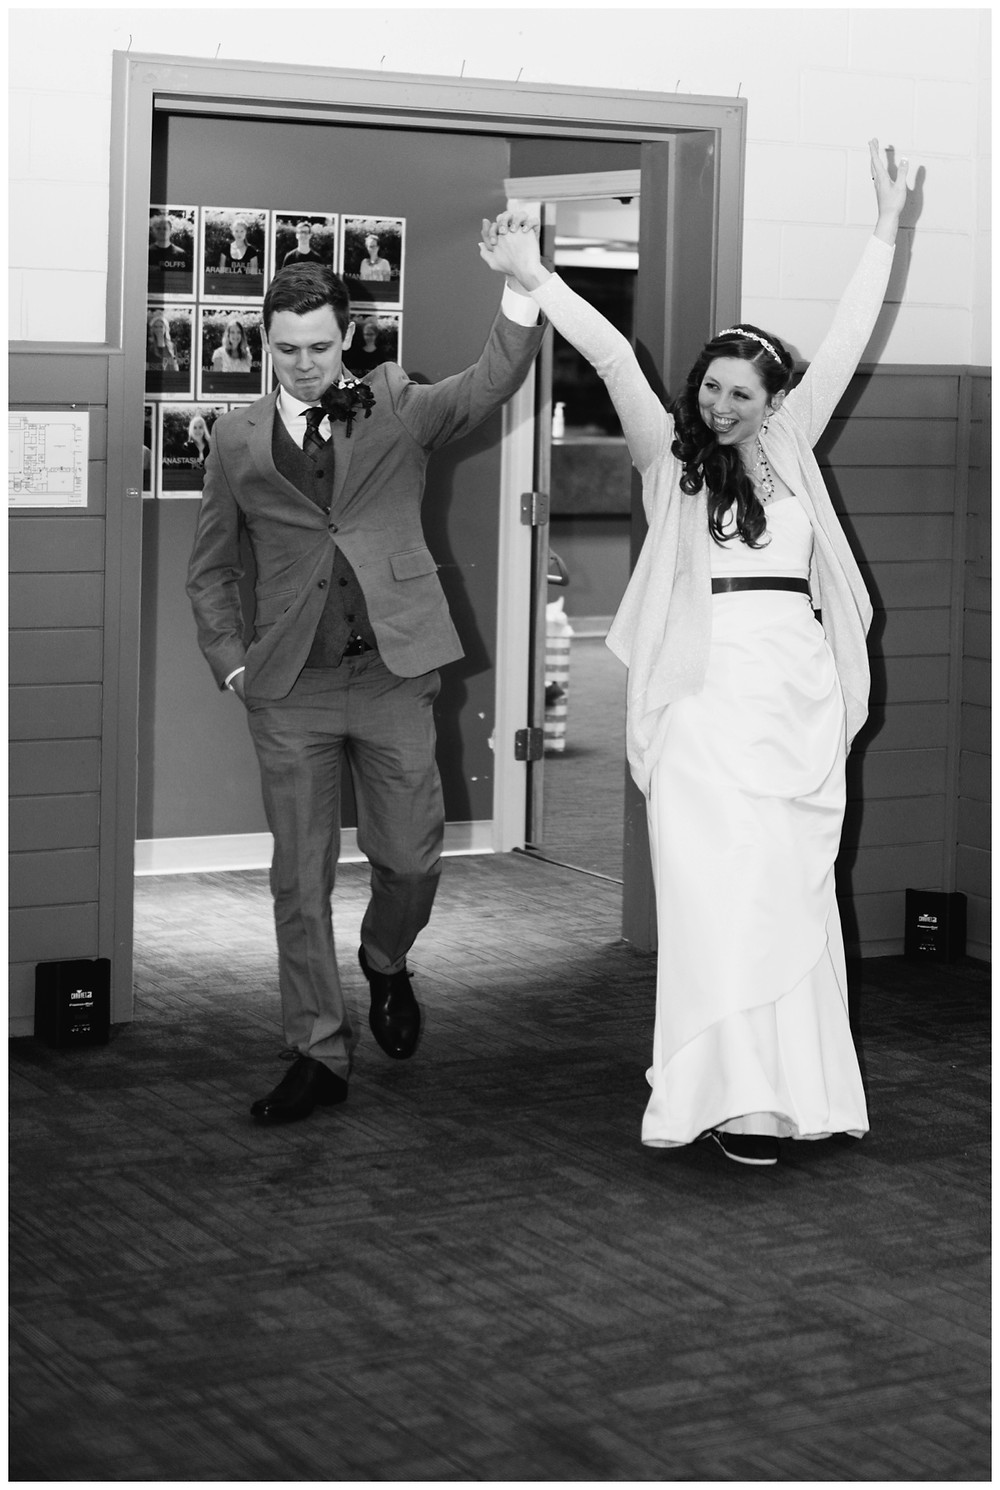 announcing-newlyweds-at-milwaukee-wedding-by-appleton-wedding-photographer-kyra-rane-photographer